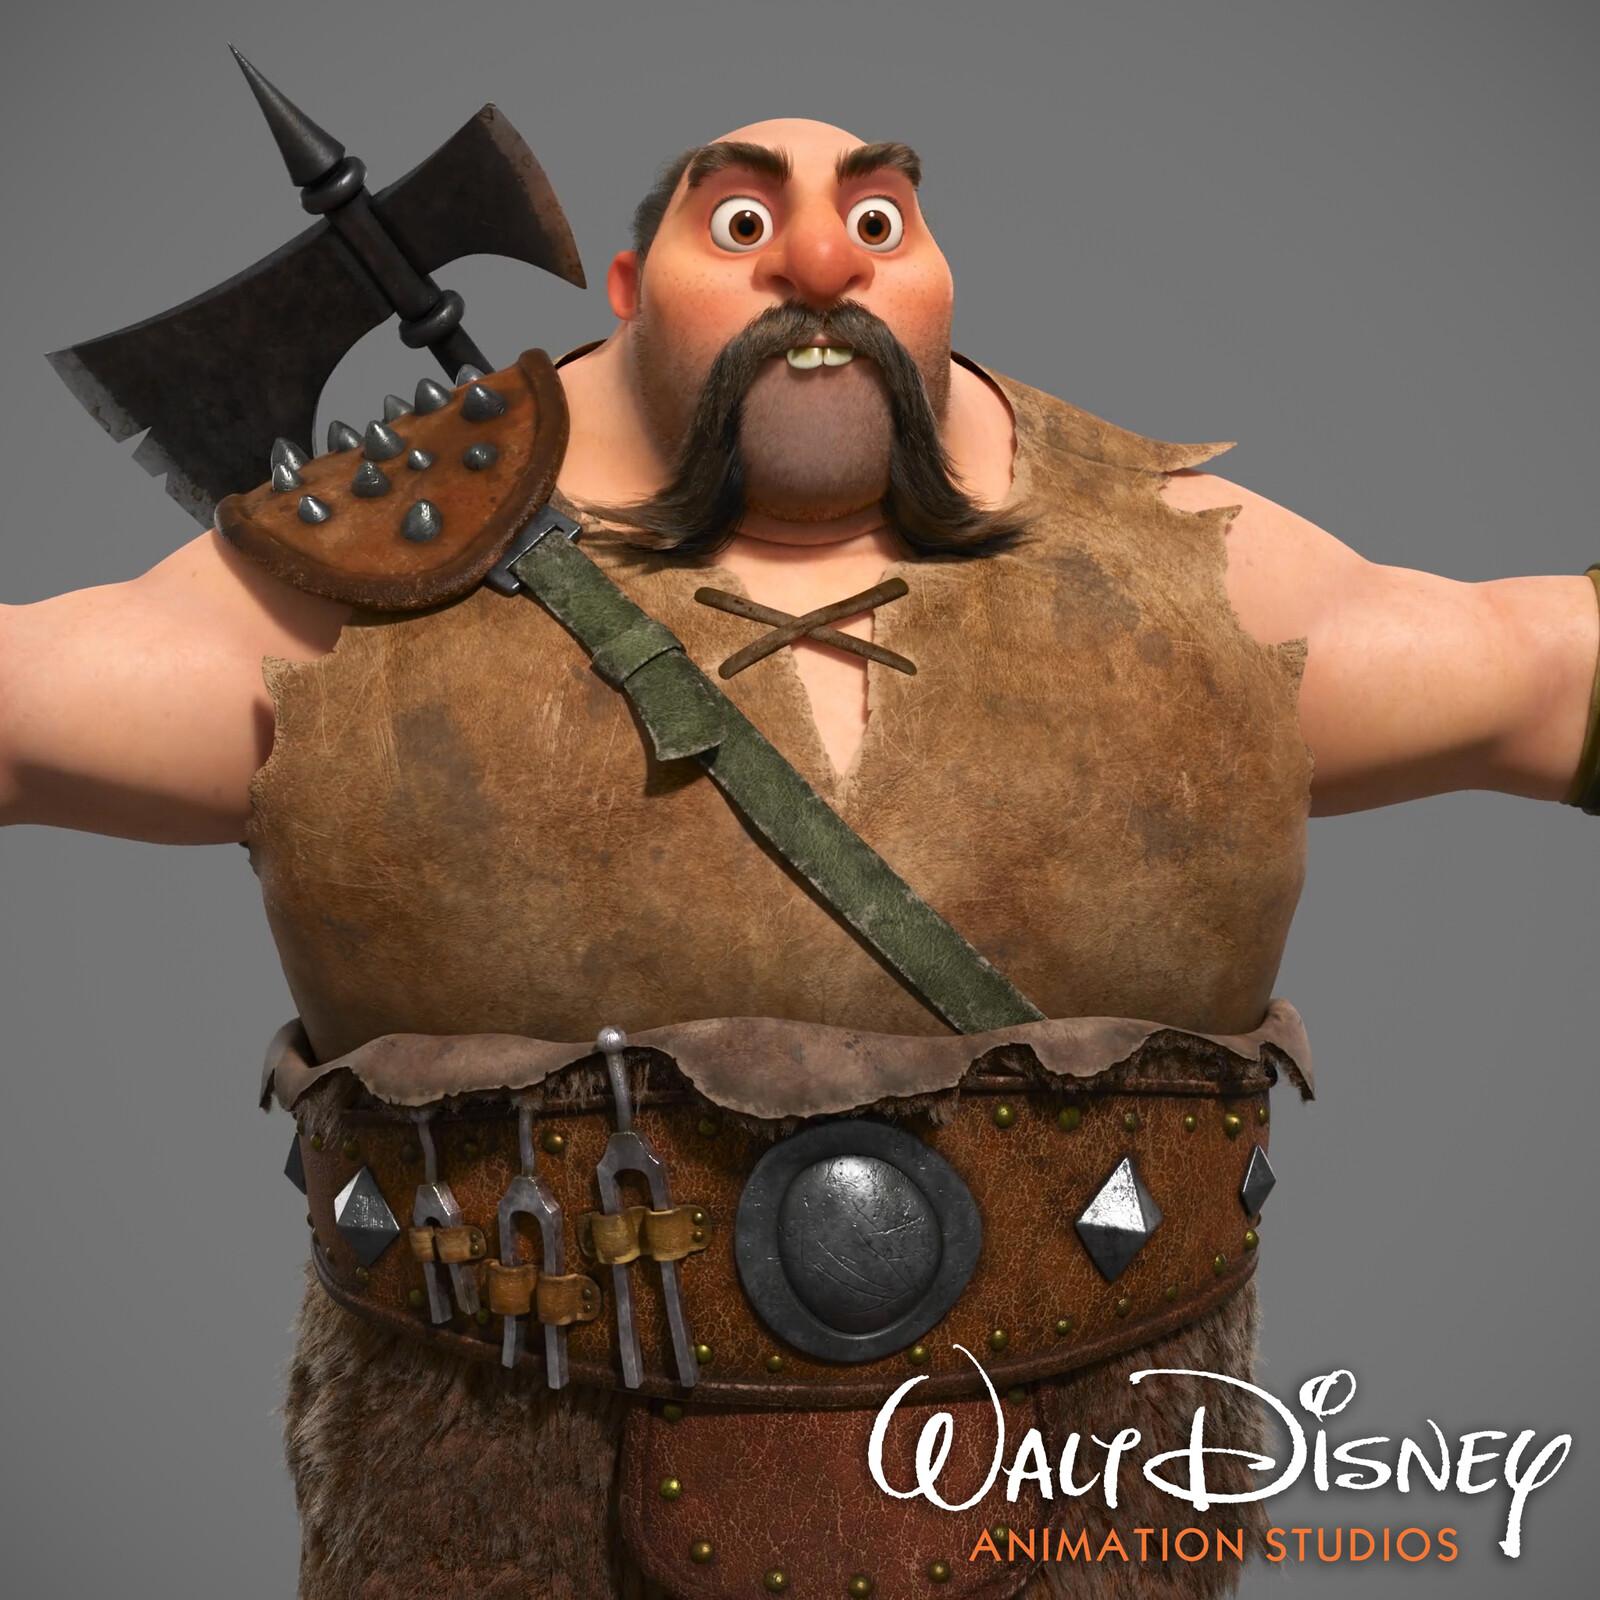 Disney Animation: Look Dev - Talent Development Training